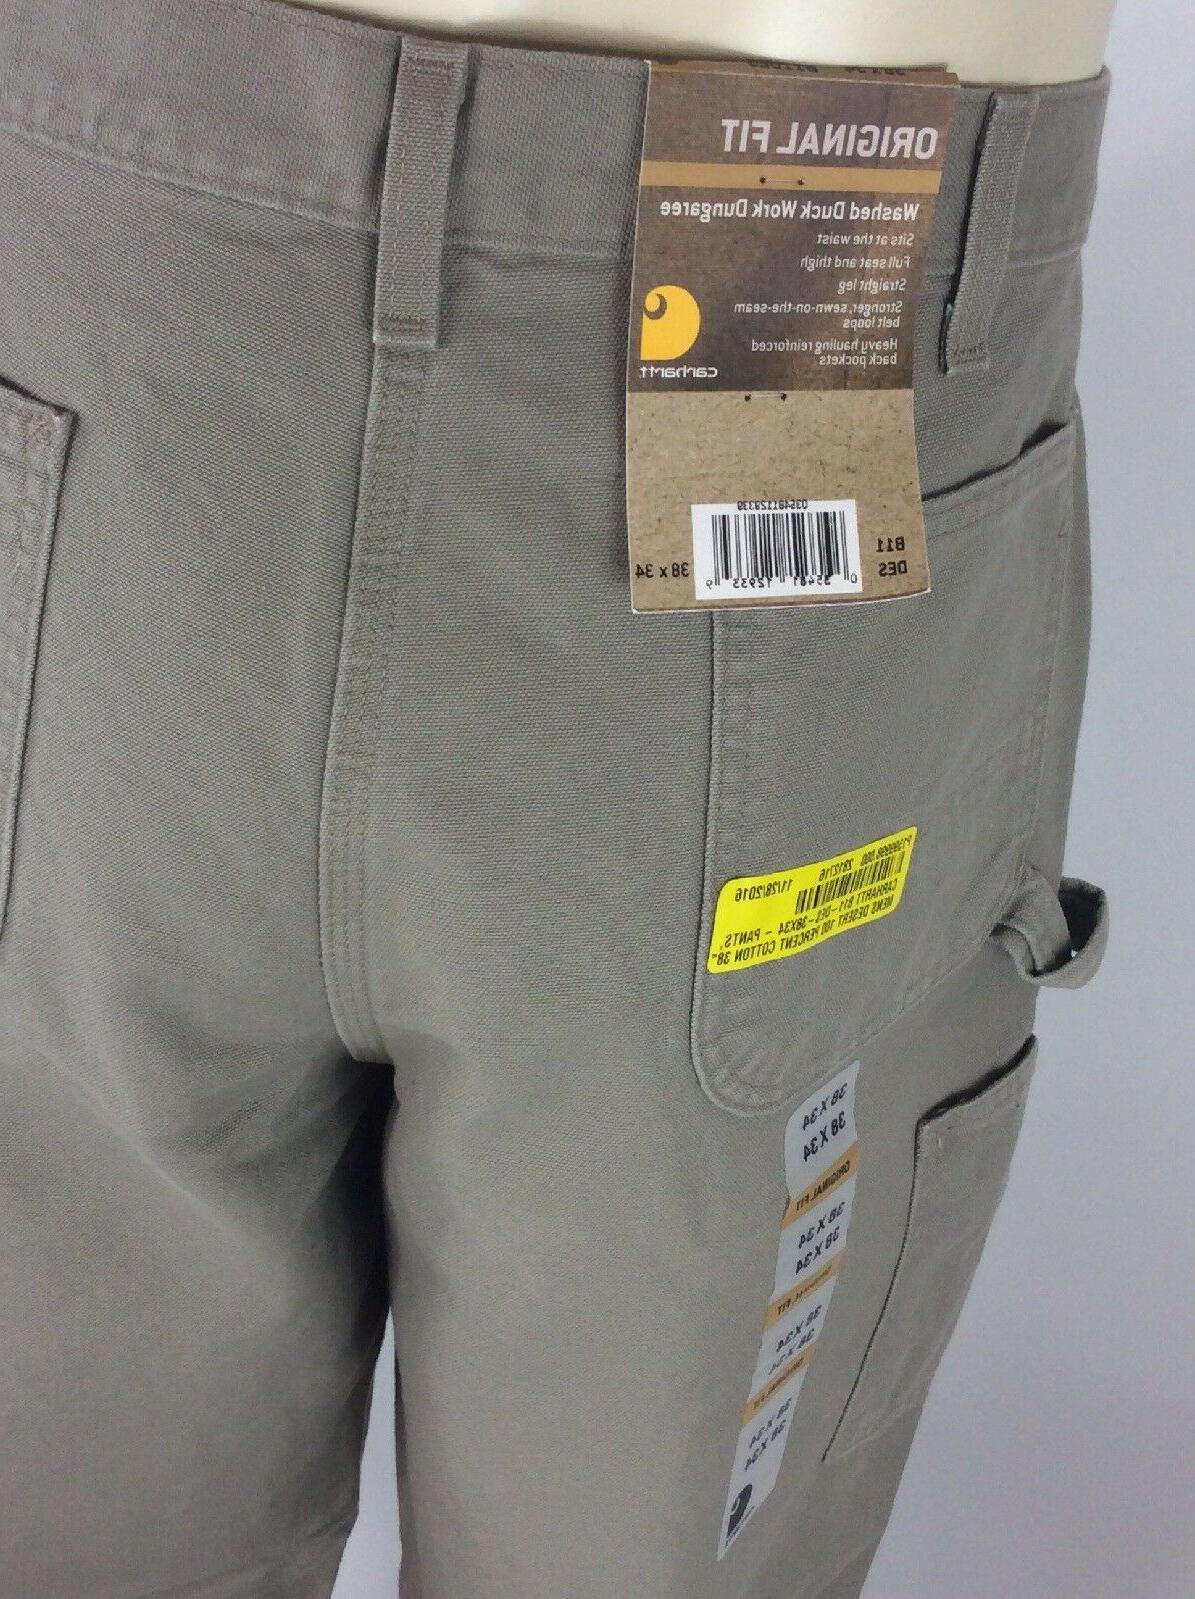 Carhartt Original Fit Duck Pants 14806 Cargo